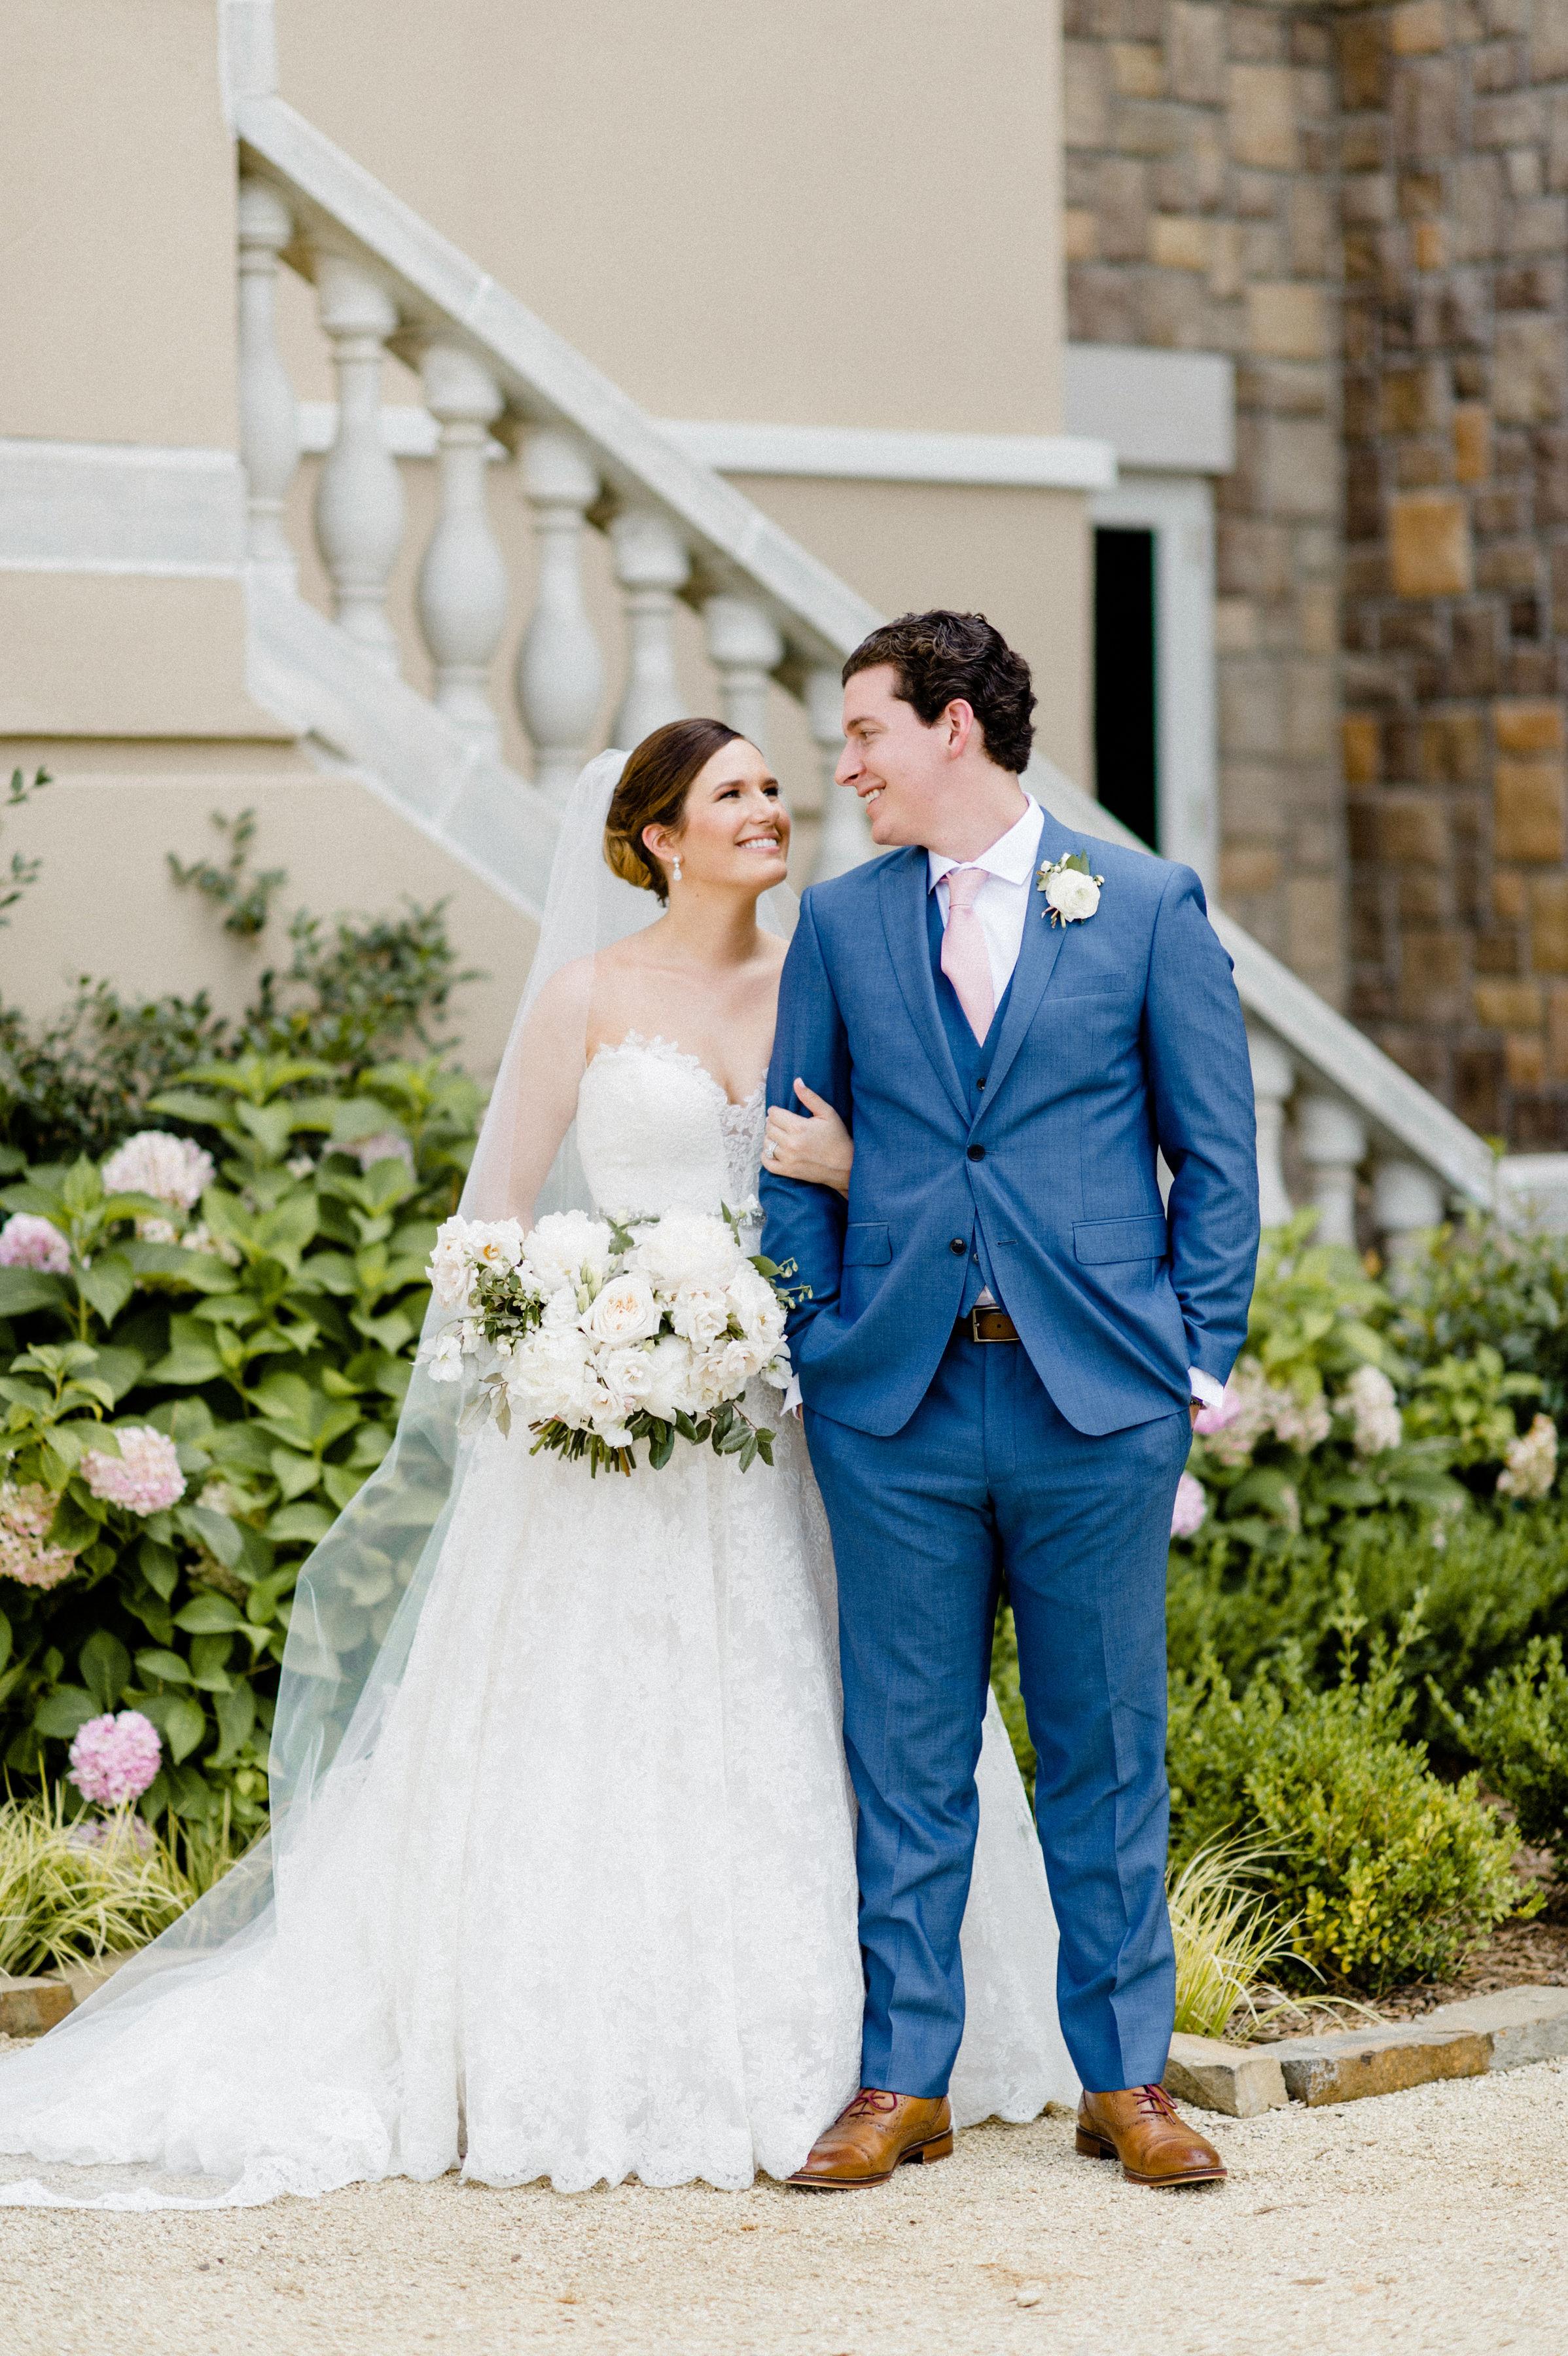 McElravey_Wedding_CarolineLimaPhotography_2018_207.jpg